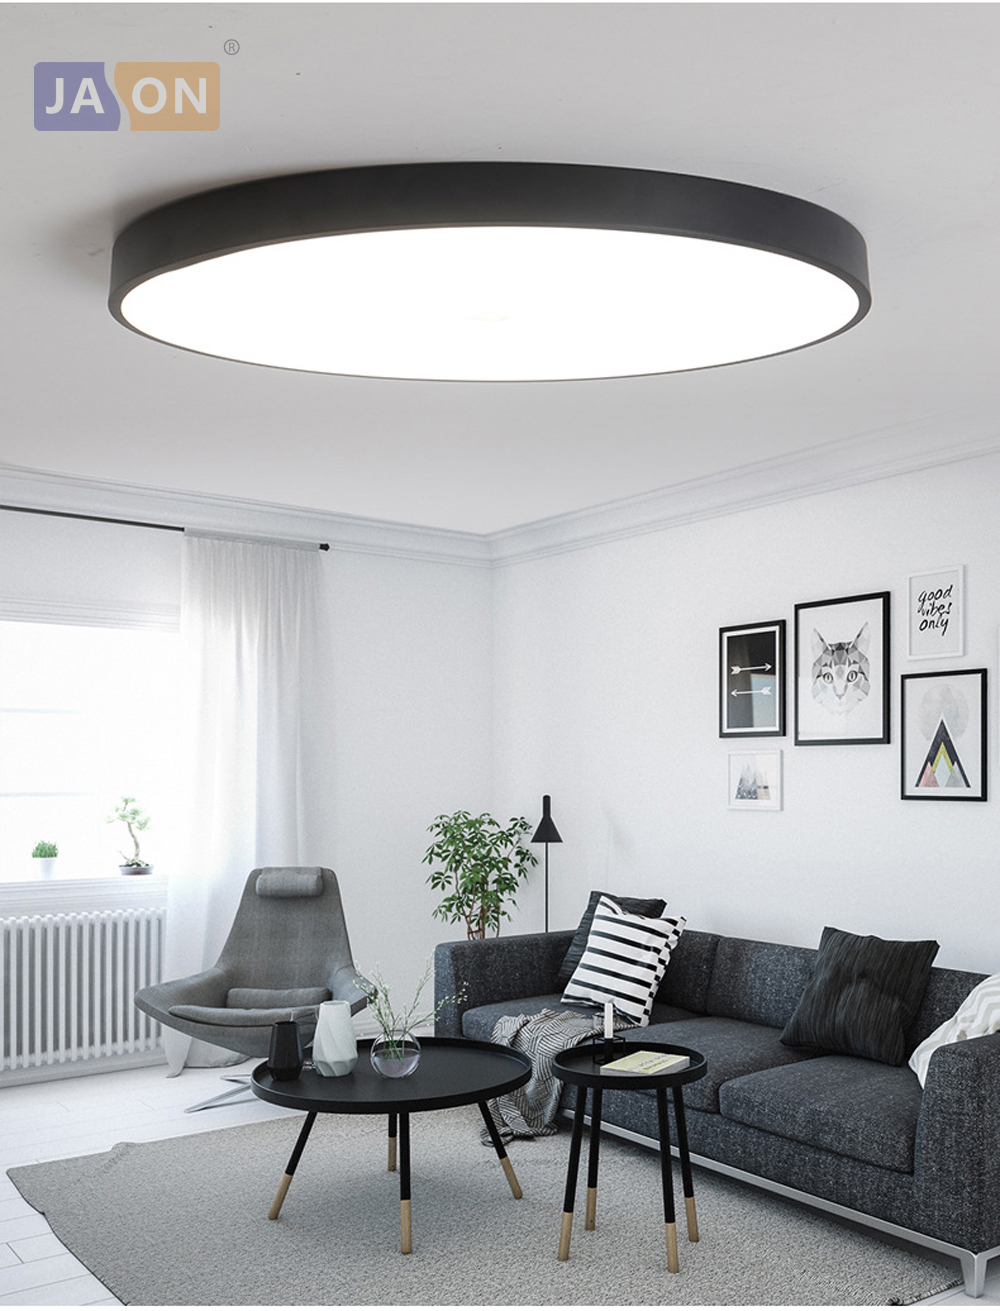 HTB1wwLjcAfb uJkHFNRq6A3vpXal LED Modern Acryl Alloy Round 5cm Super Thin LED Lamp.LED Light.Ceiling Lights.LED Ceiling Light.Ceiling Lamp For Foyer Bedroom